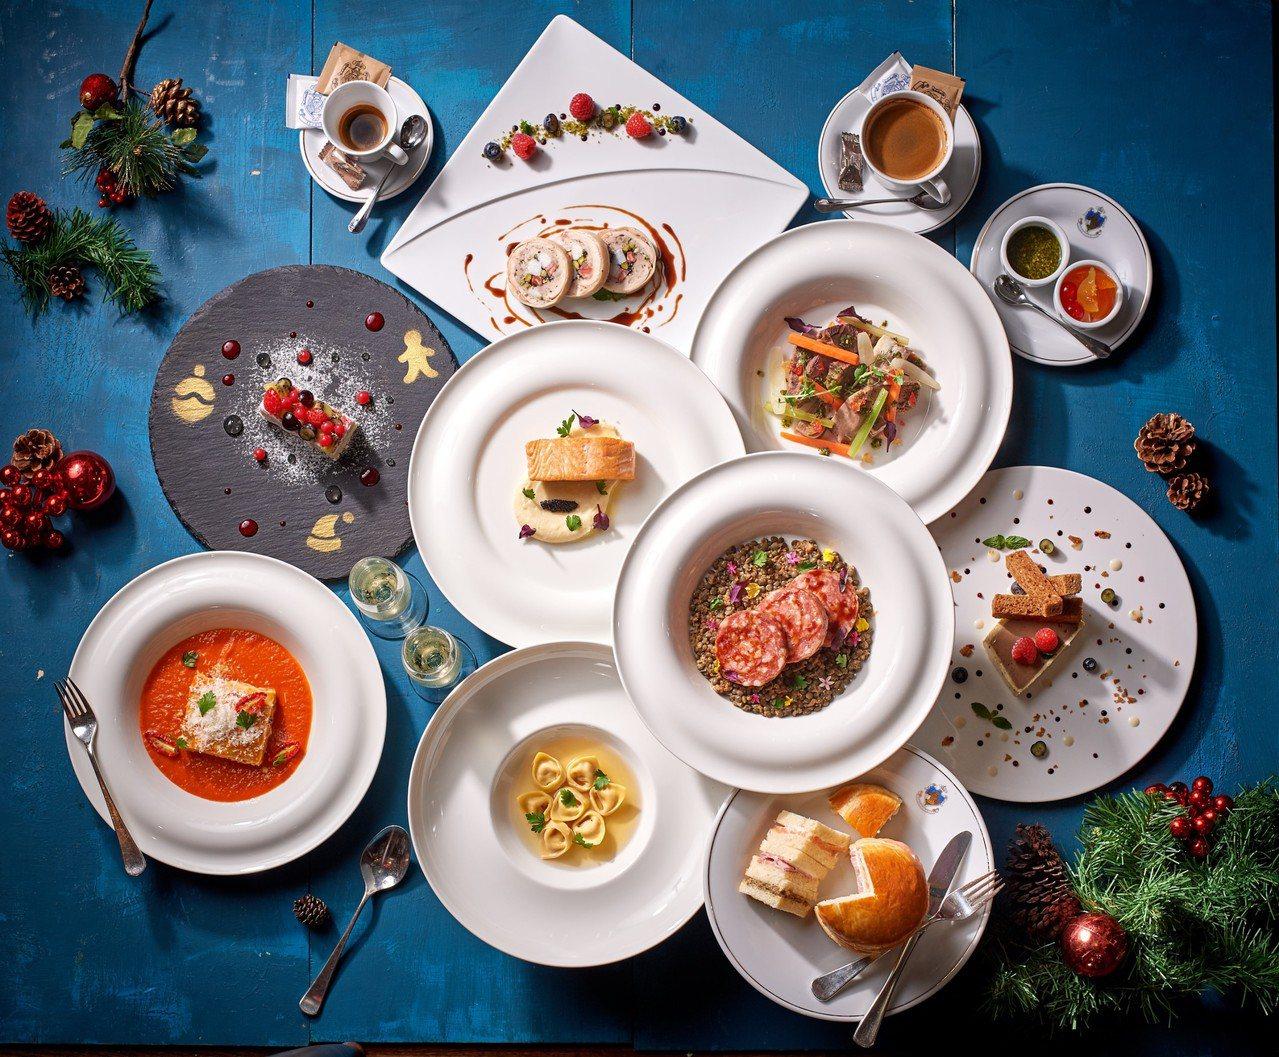 Caffe Florian福里安花神咖啡「義式豪華耶誕節雙人套餐」售價4,500...